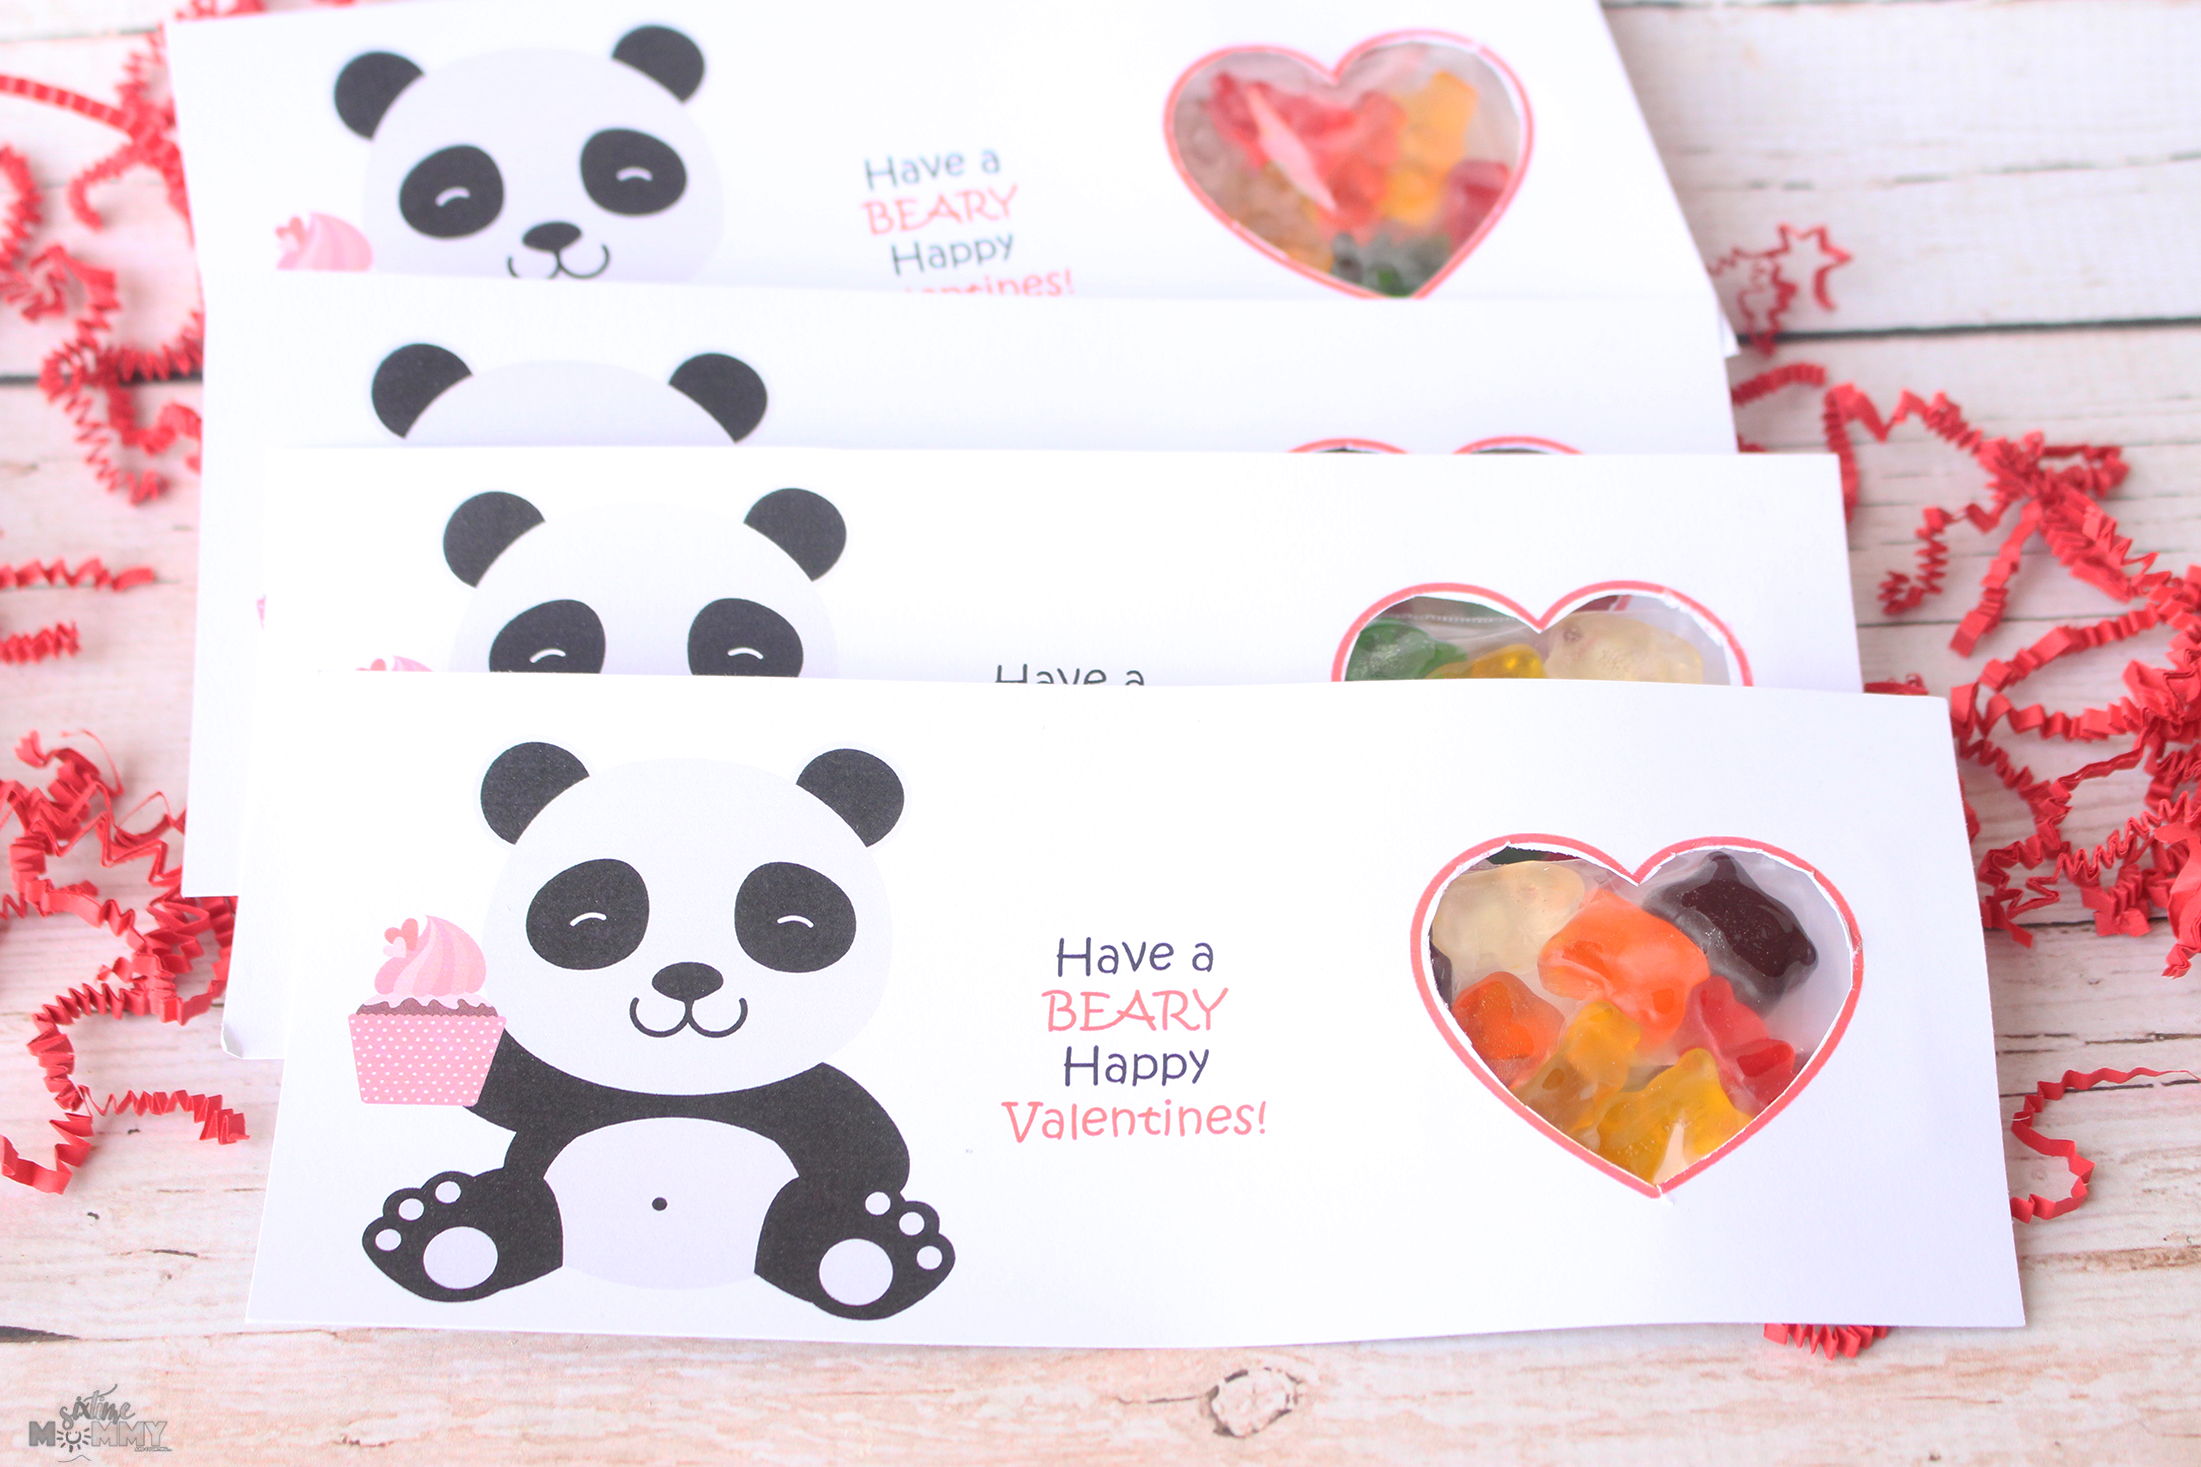 Sweet Treat: DIY Valentine's Gummy Bear Treats With FREE Printable